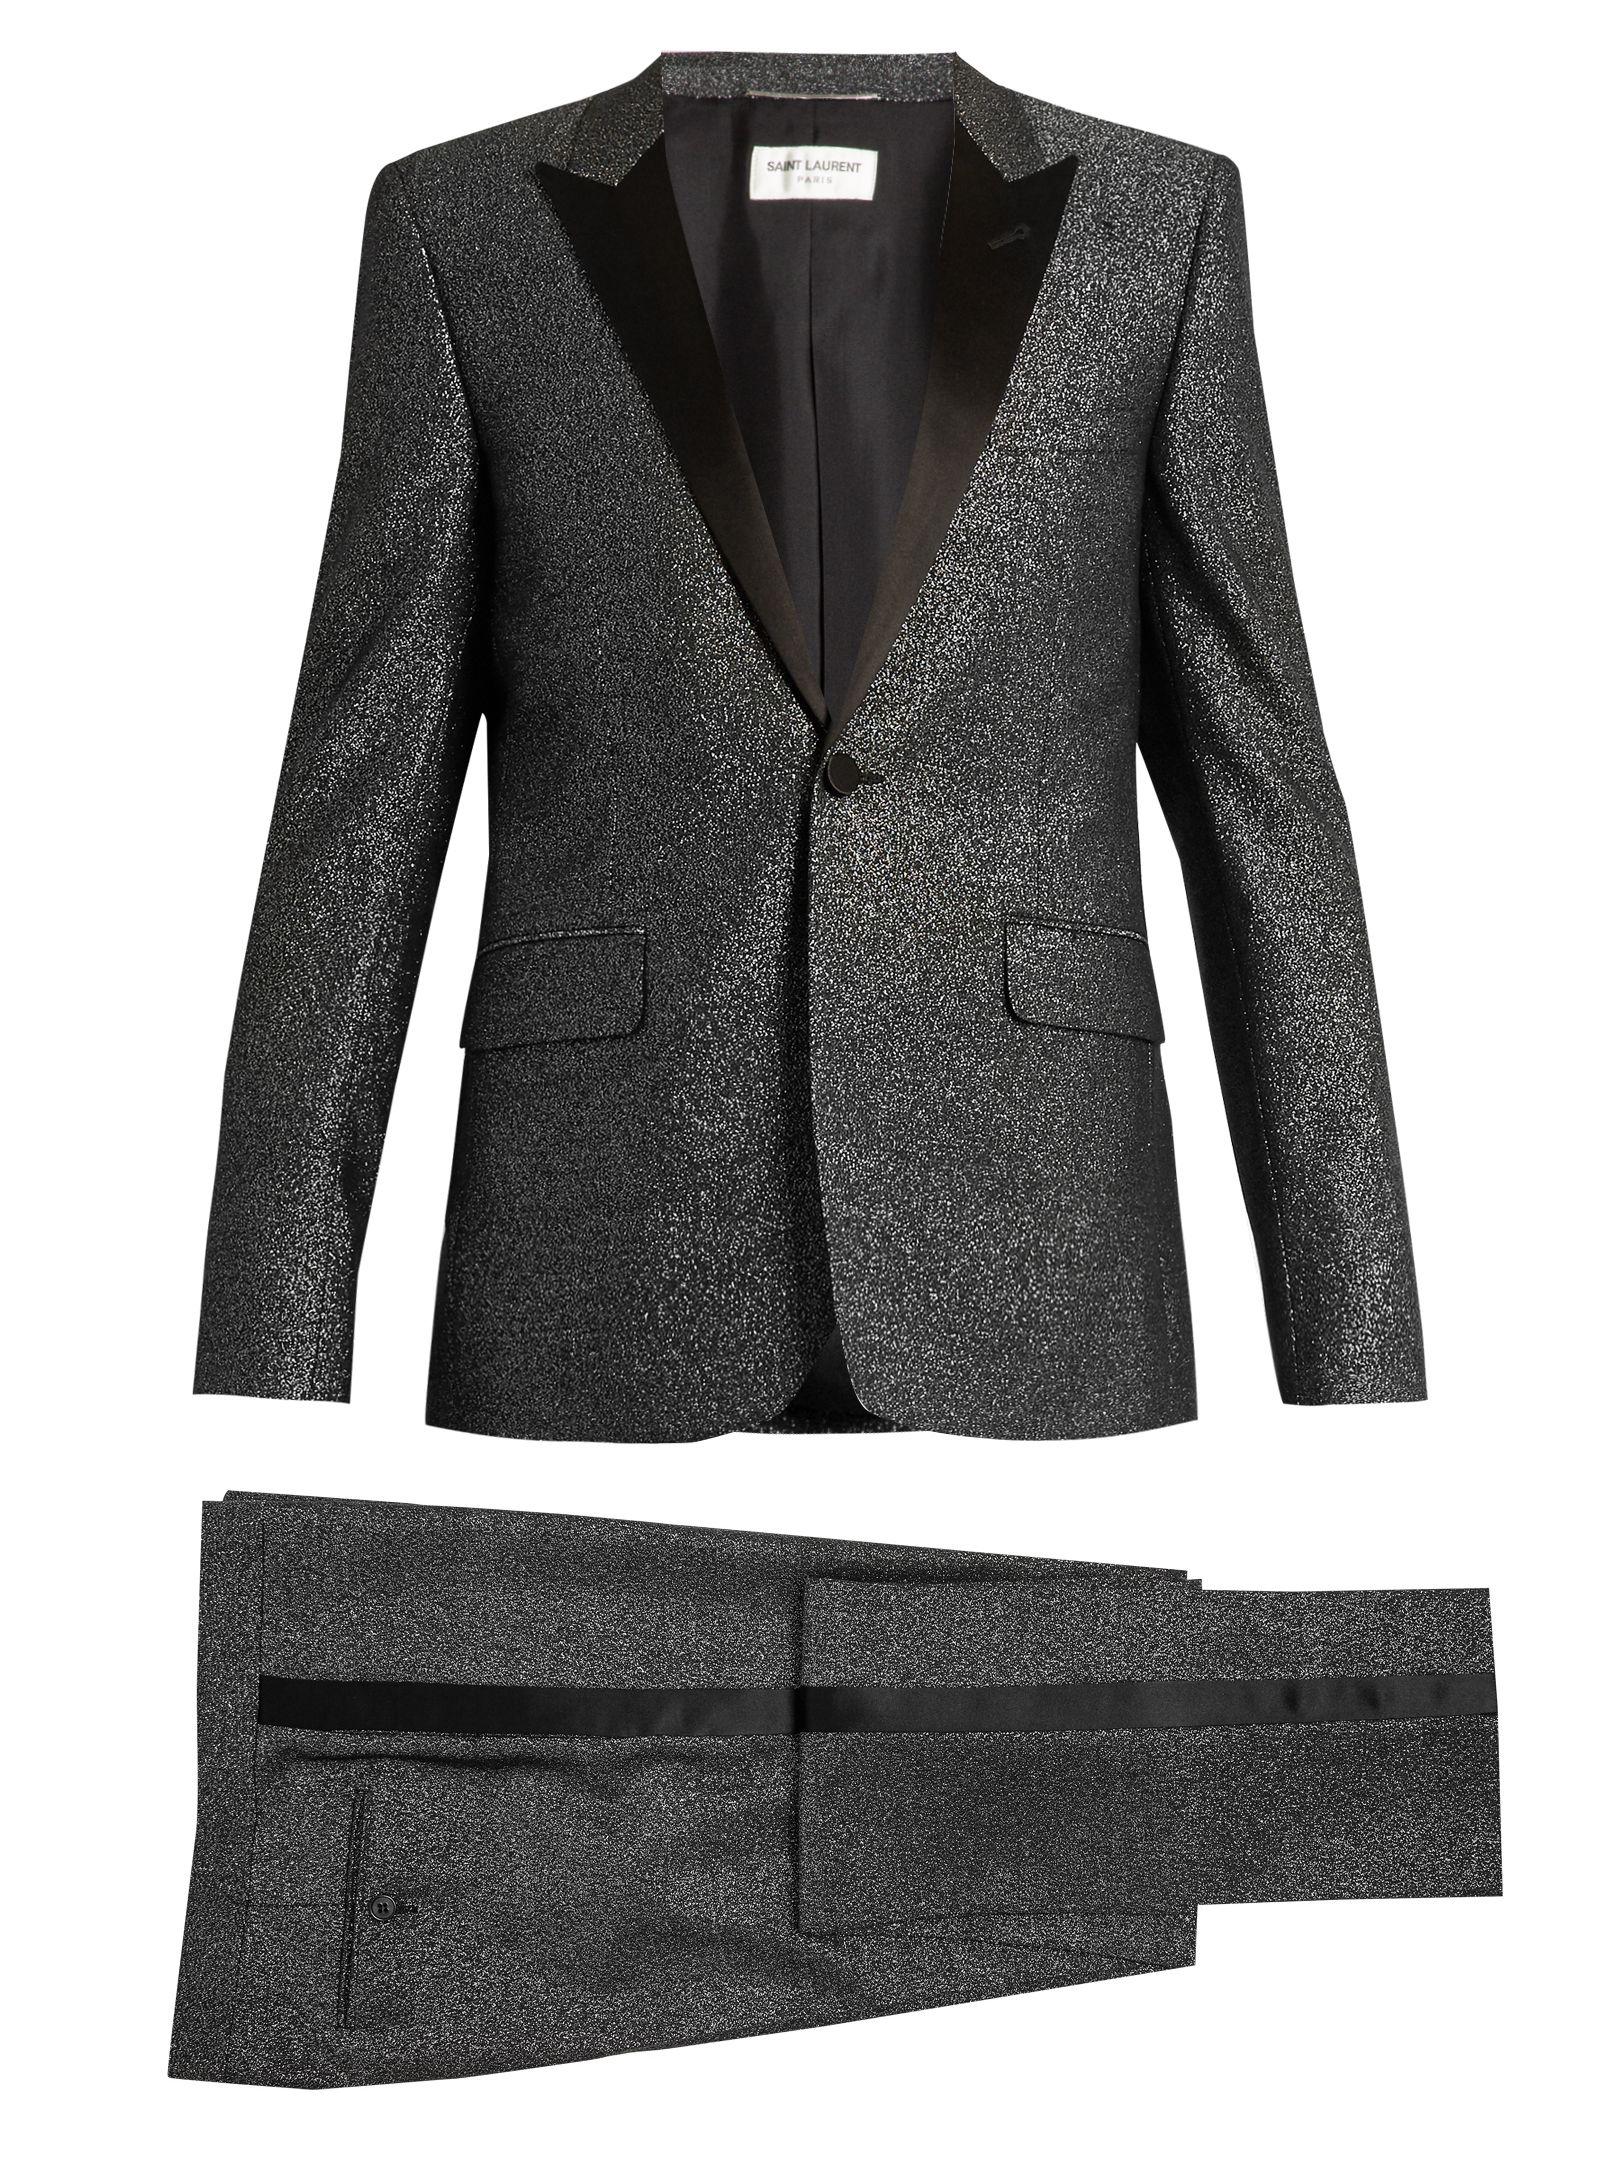 34a6b0ce7d7 Click here to buy Saint Laurent Sparkle satin-lapel wool-blend tuxedo at  MATCHESFASHION.COM